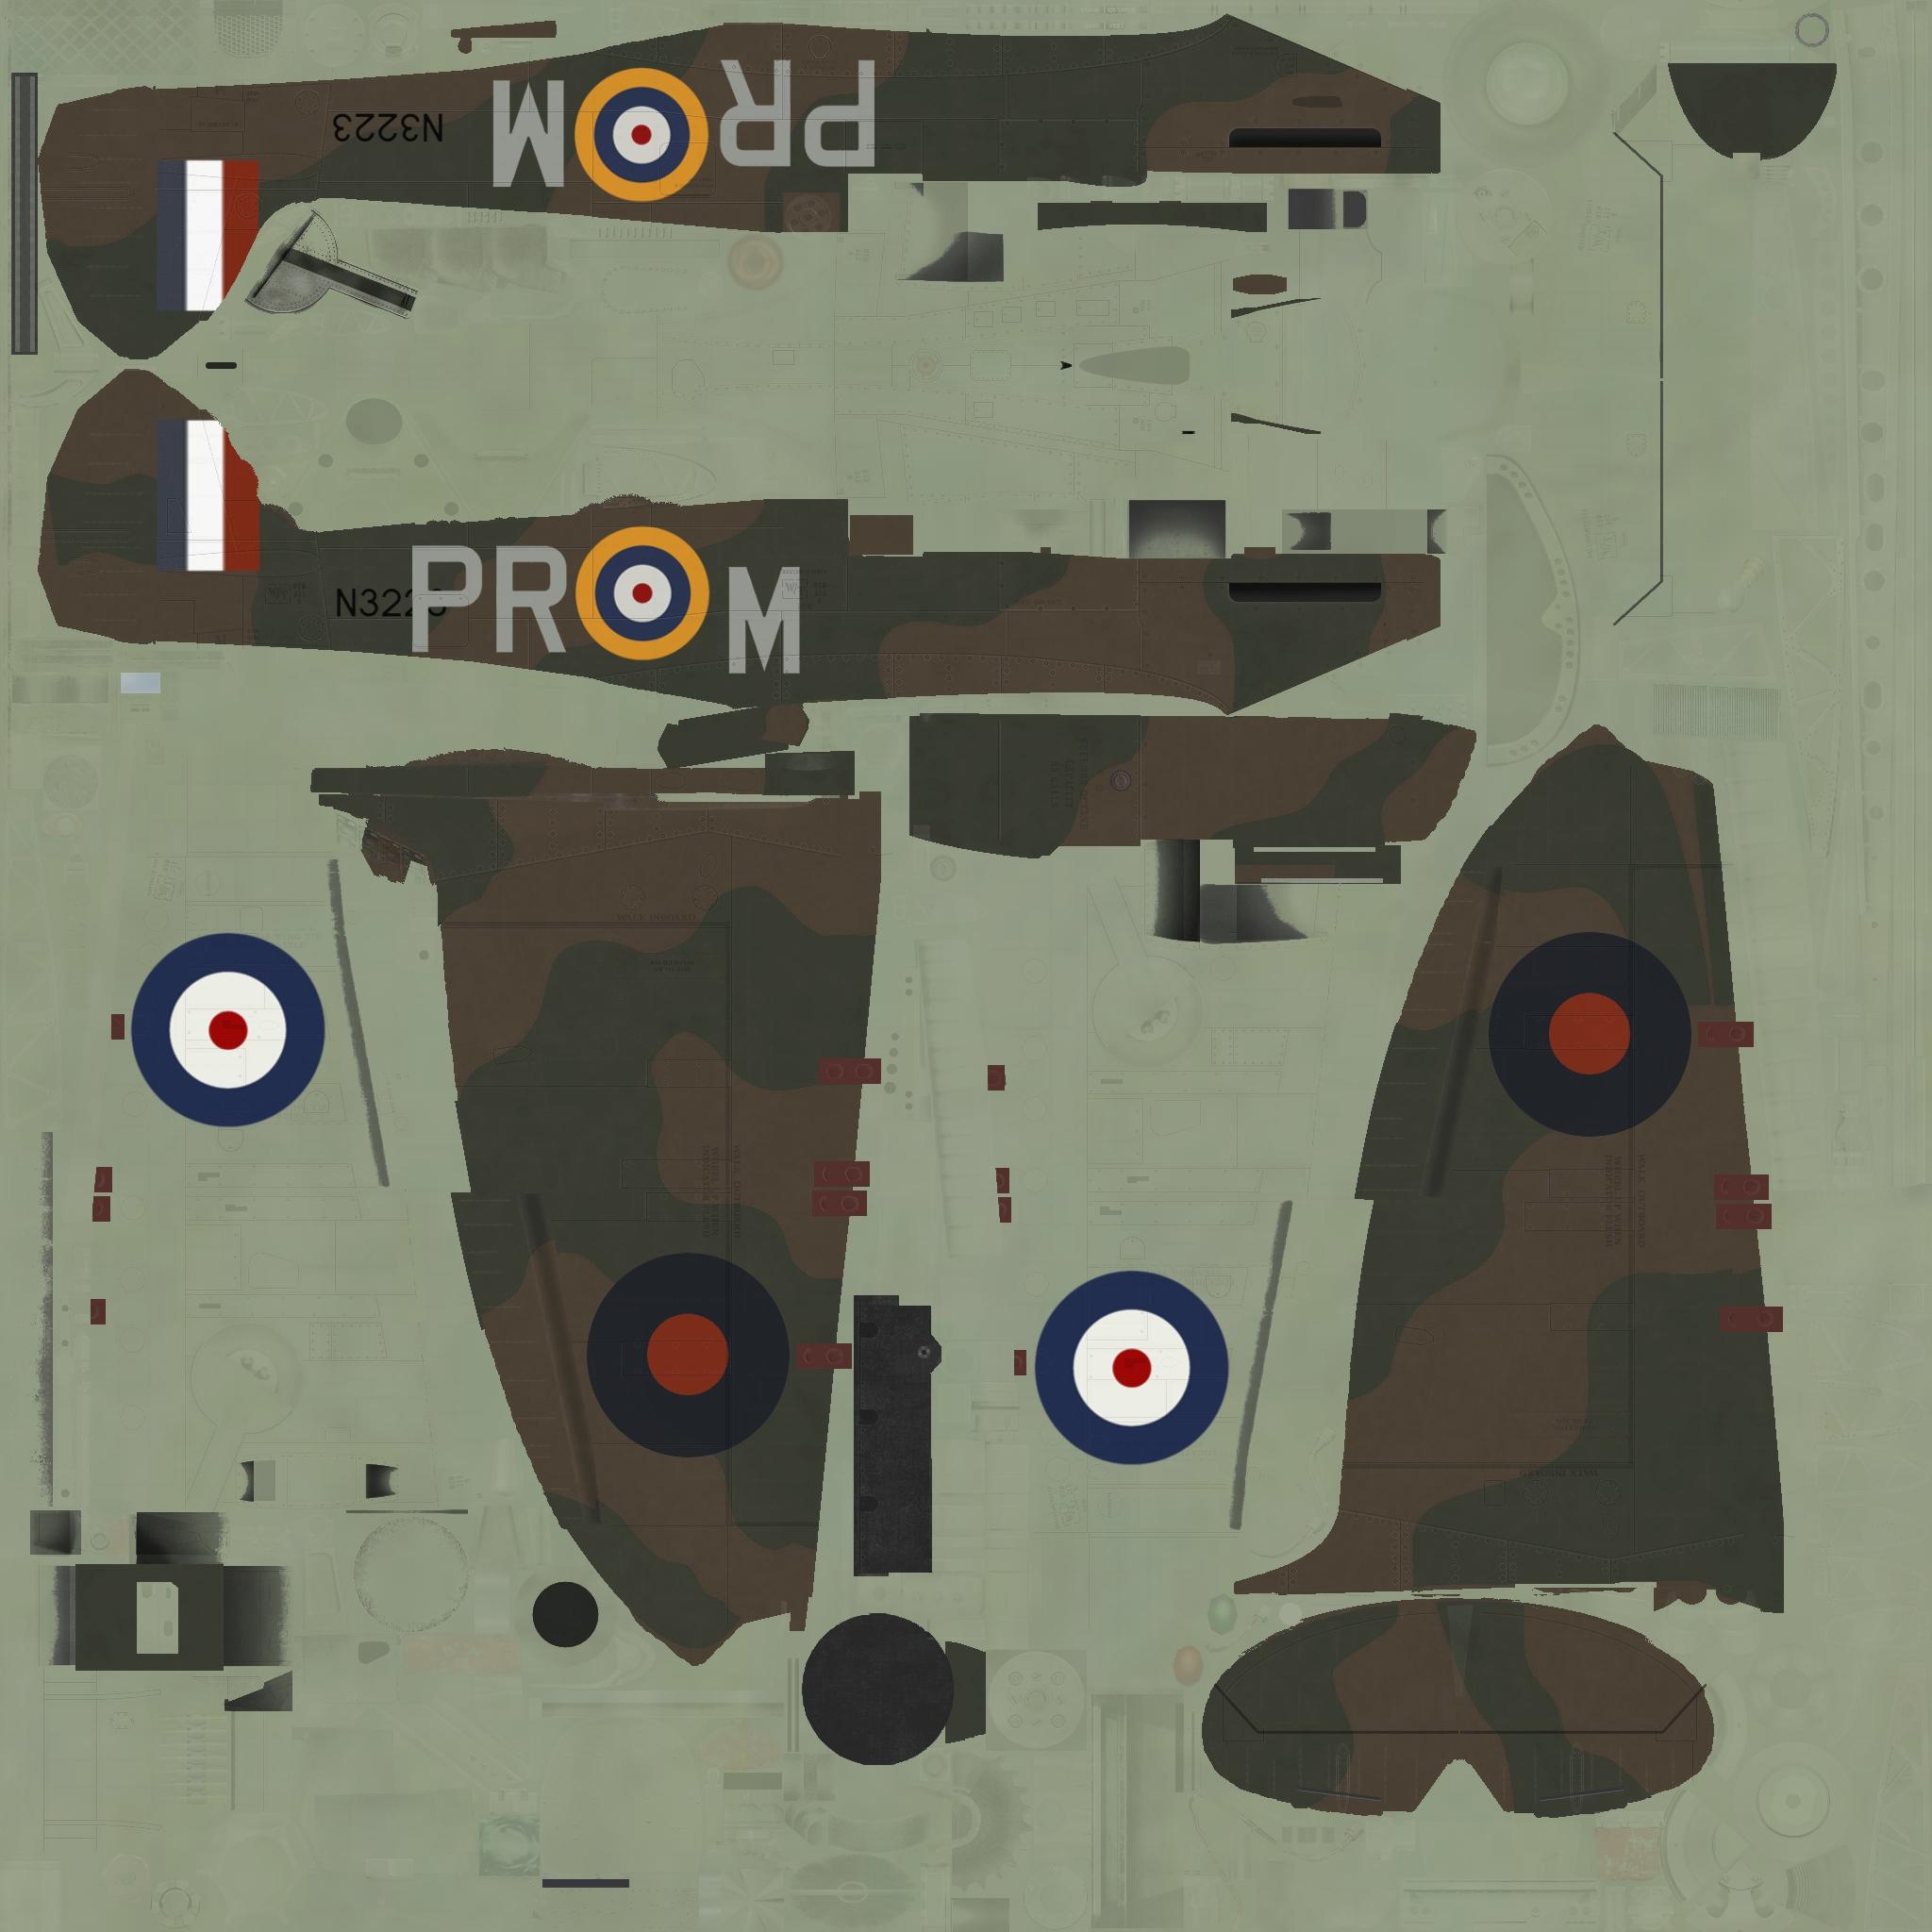 COD C6 MkI RAF 609Sqn PRM Tadeusz S Nowierski N3223 Middle Wallop 1940